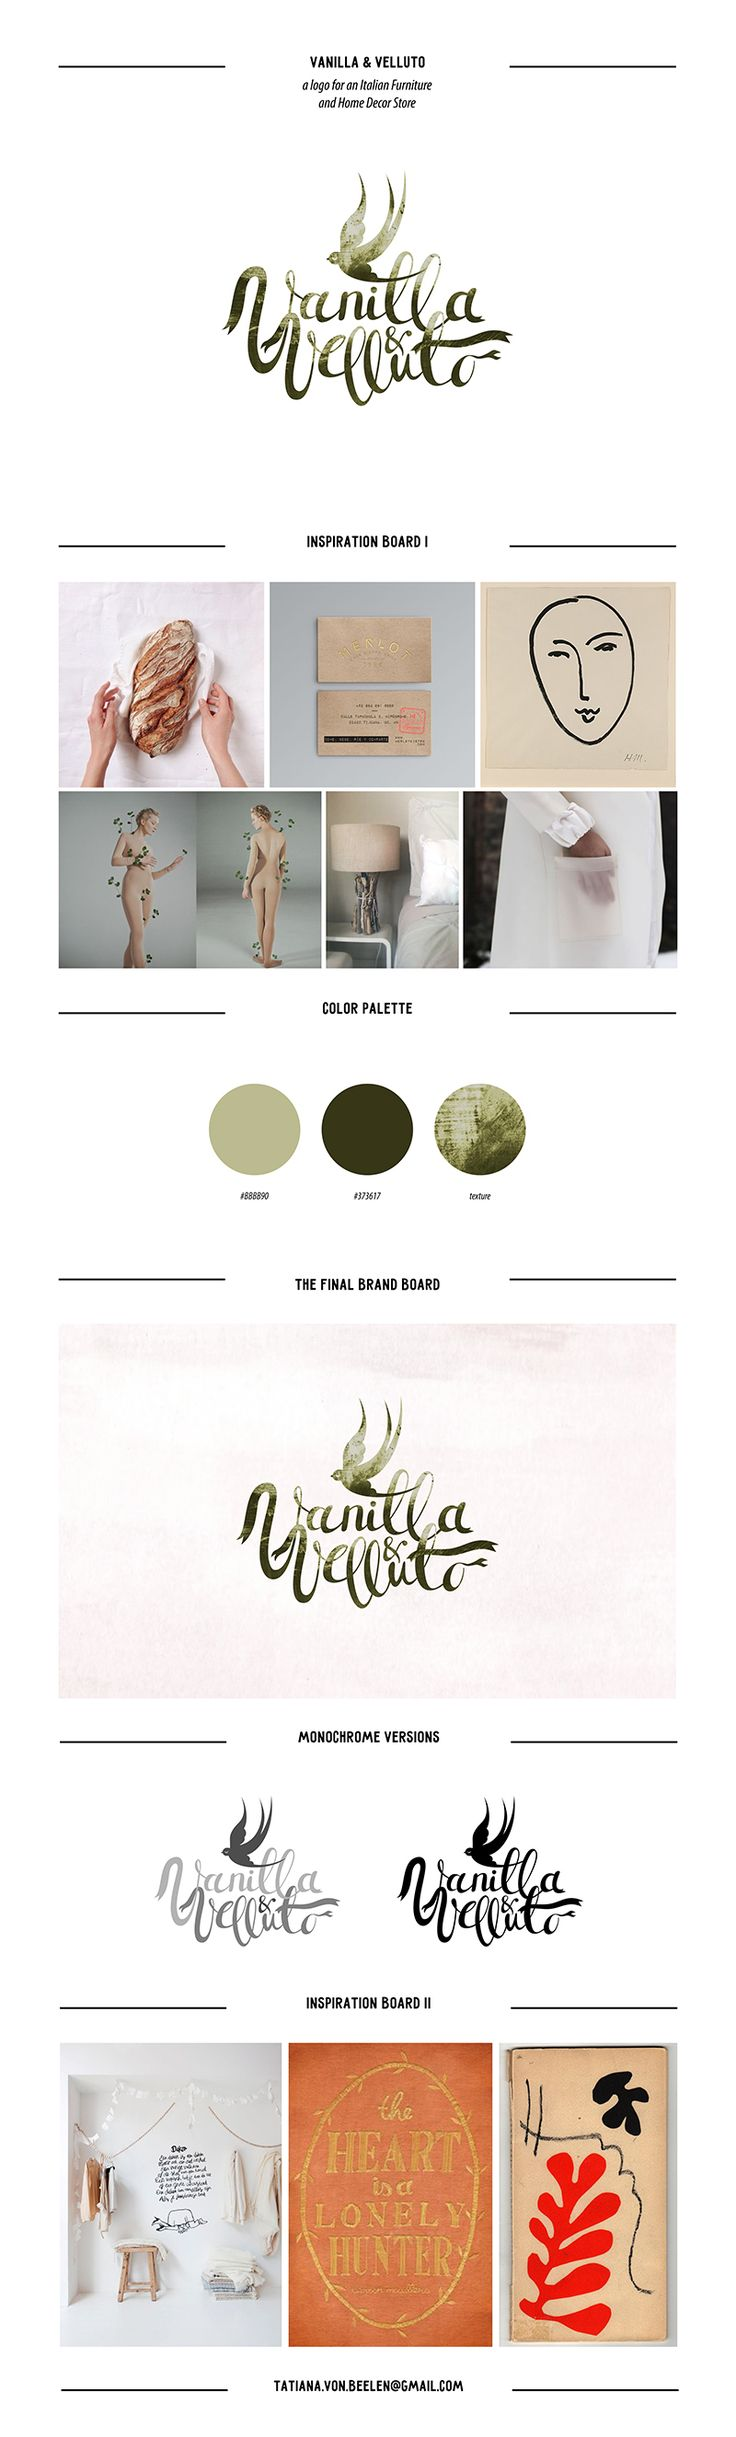 #logotype #logo #inspiration #design #board #graphic #branding #calligraphy #letteringring #romantic #whimsical #wedding #homedecor #furniture #store  Vanilla & Velluto logo on Behance logo